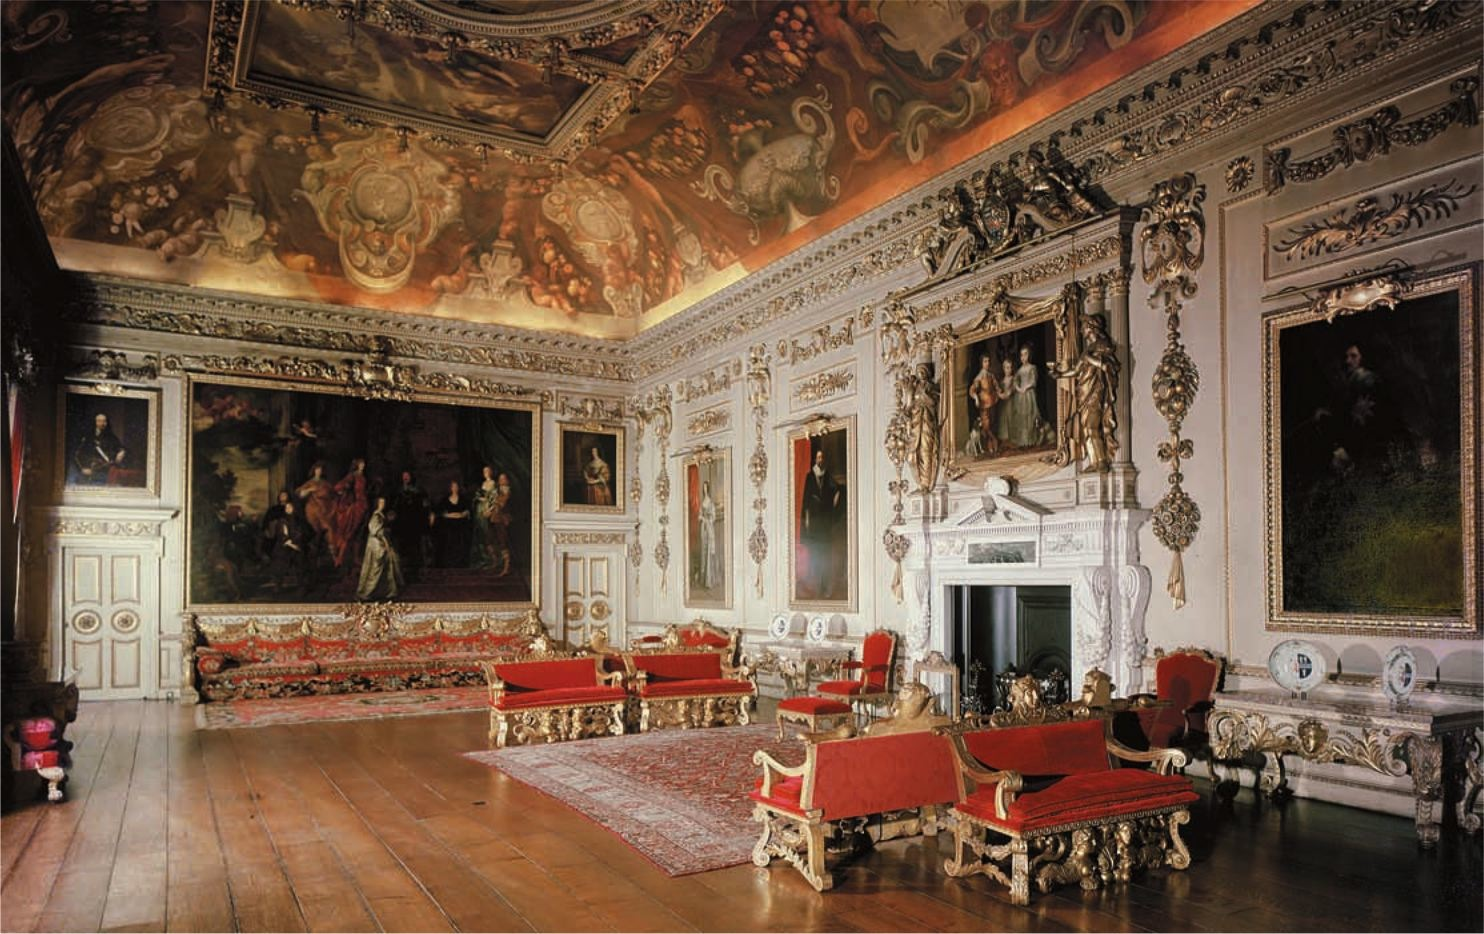 Best Kitchen Gallery: English Renaissance Design History of English Renaissance Architecture on rachelxblog.com